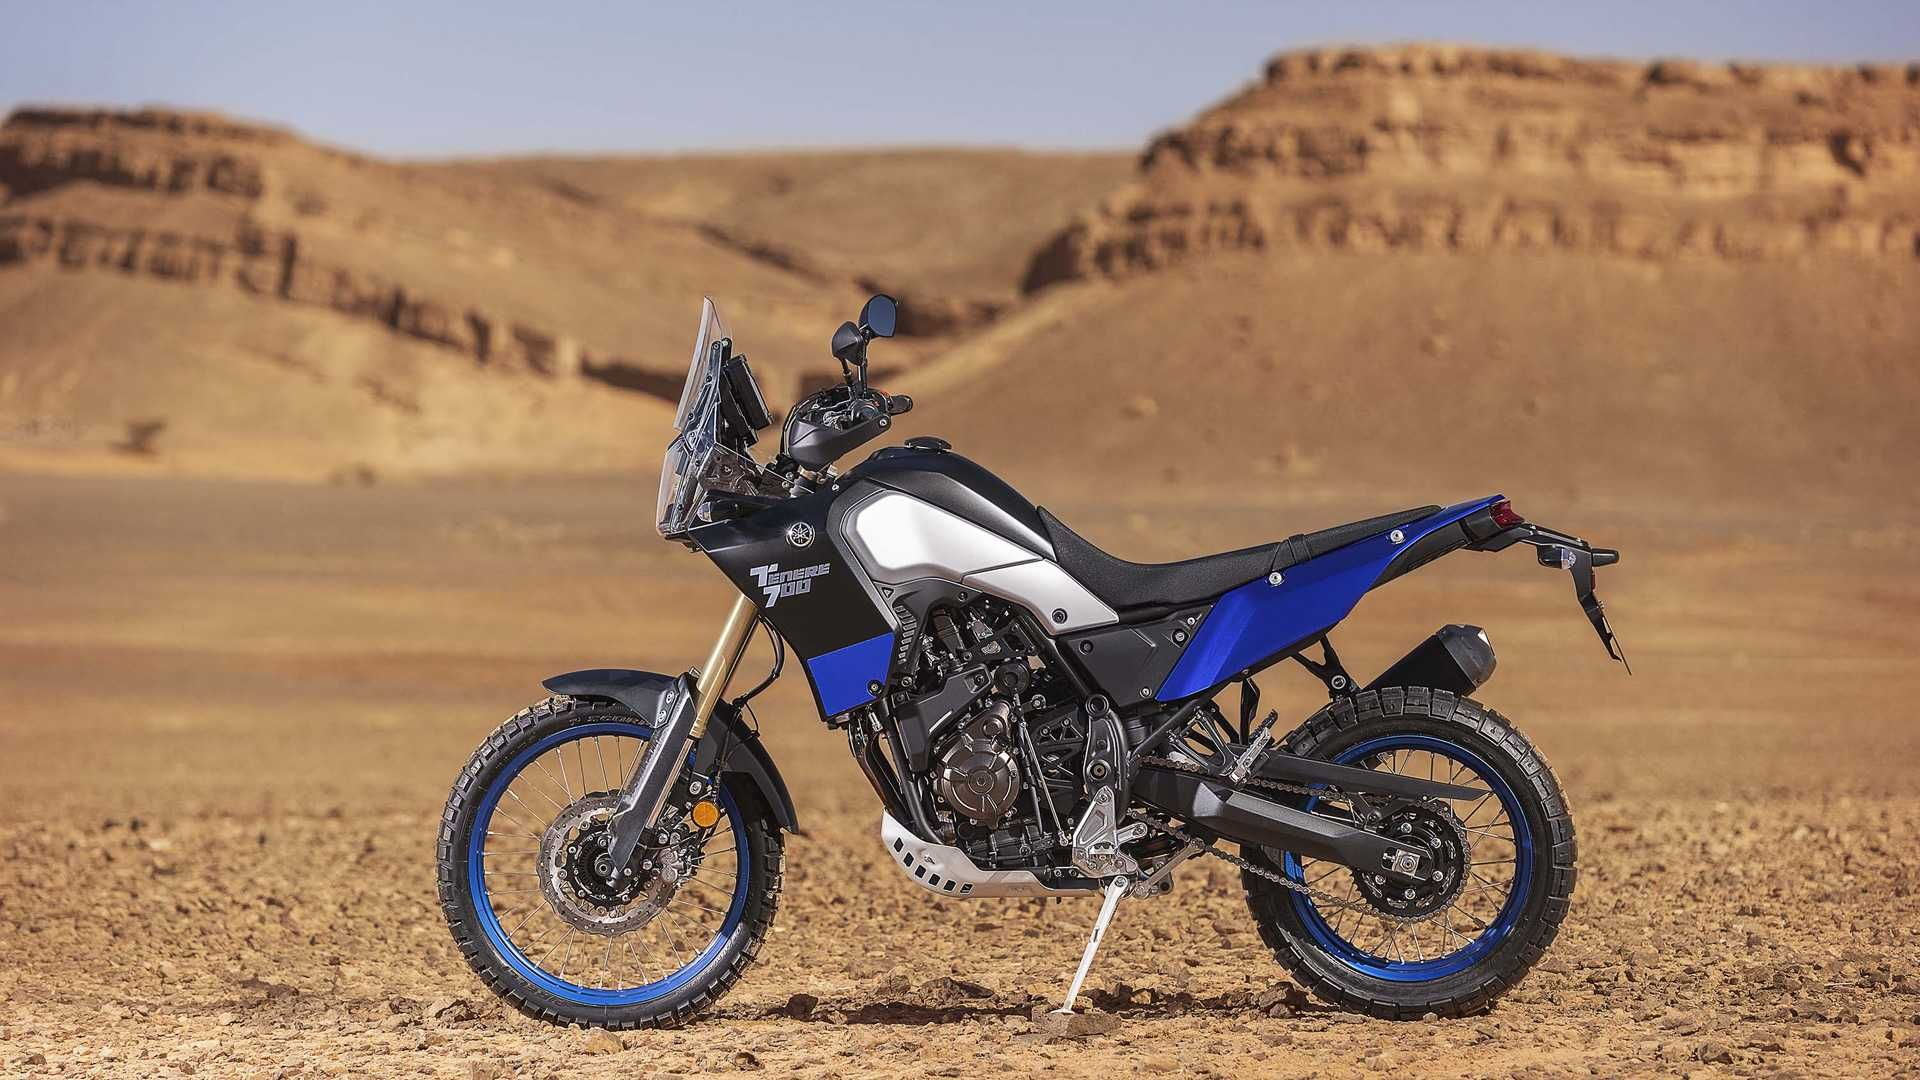 2021 Yamaha Tenere 700 Everything We Know Adventure Bike